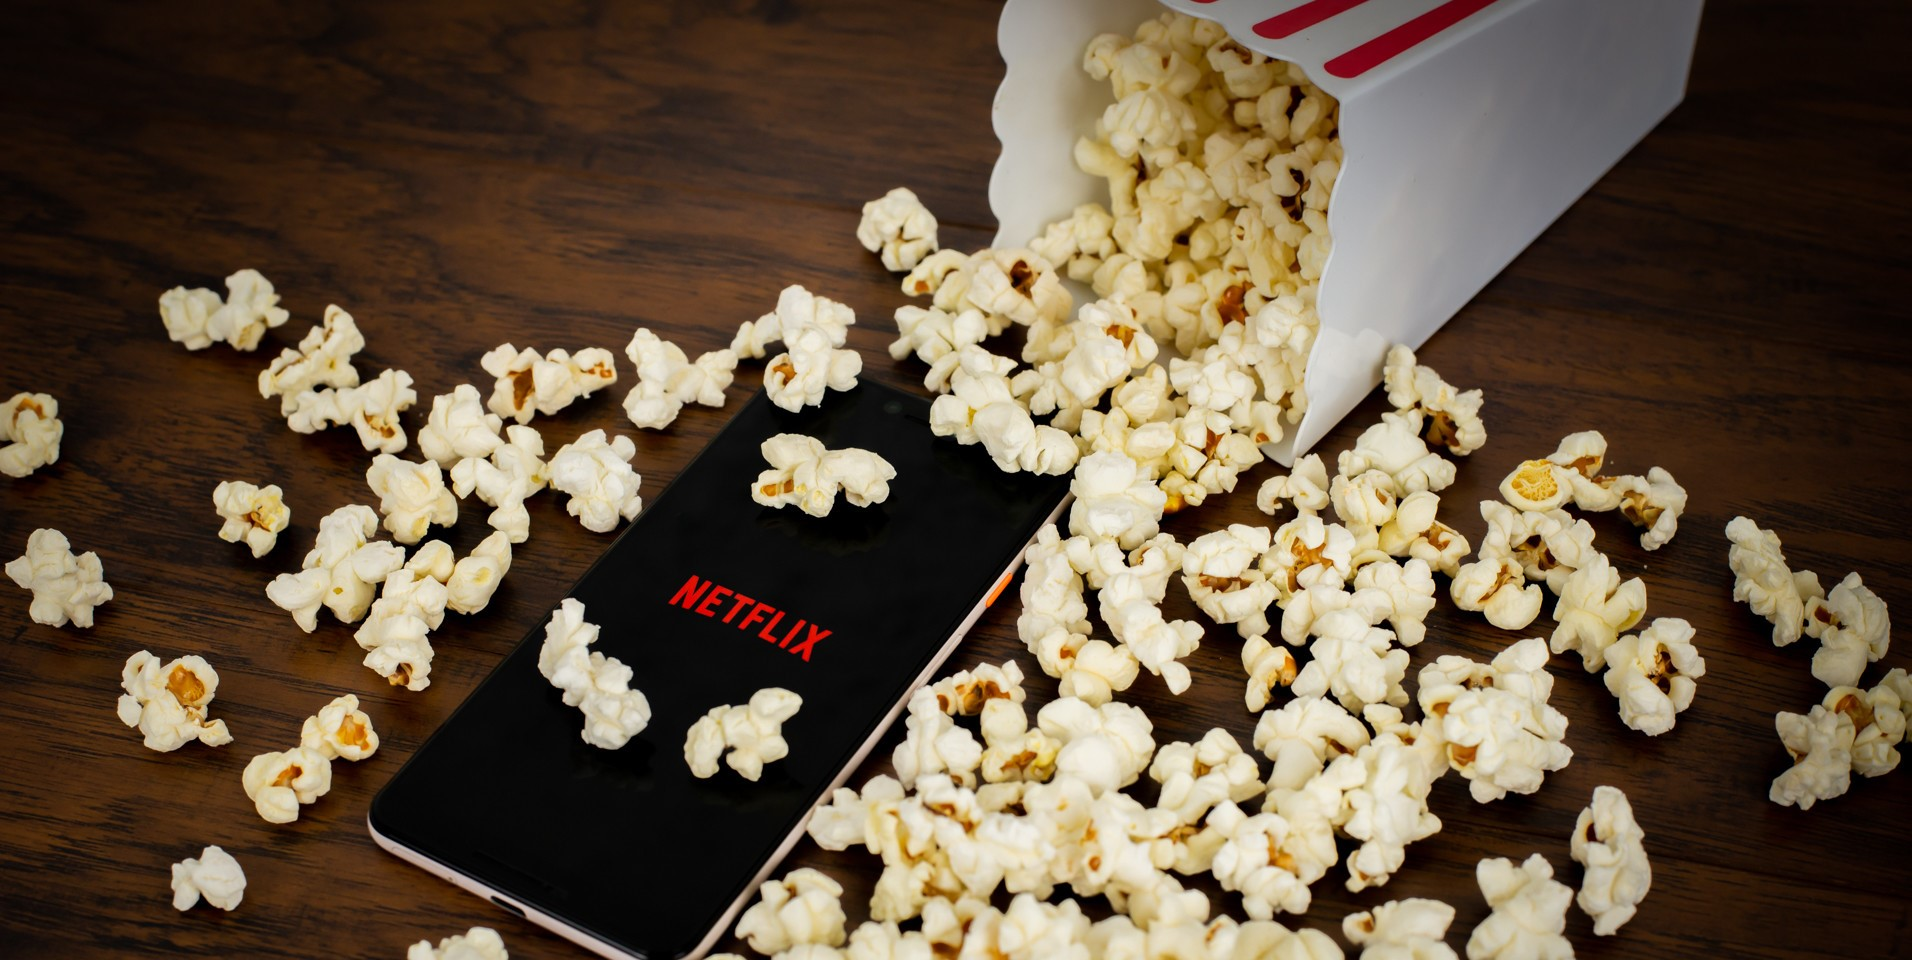 Netflix Party για να δείτε σειρά ή ταινία με φίλους σας